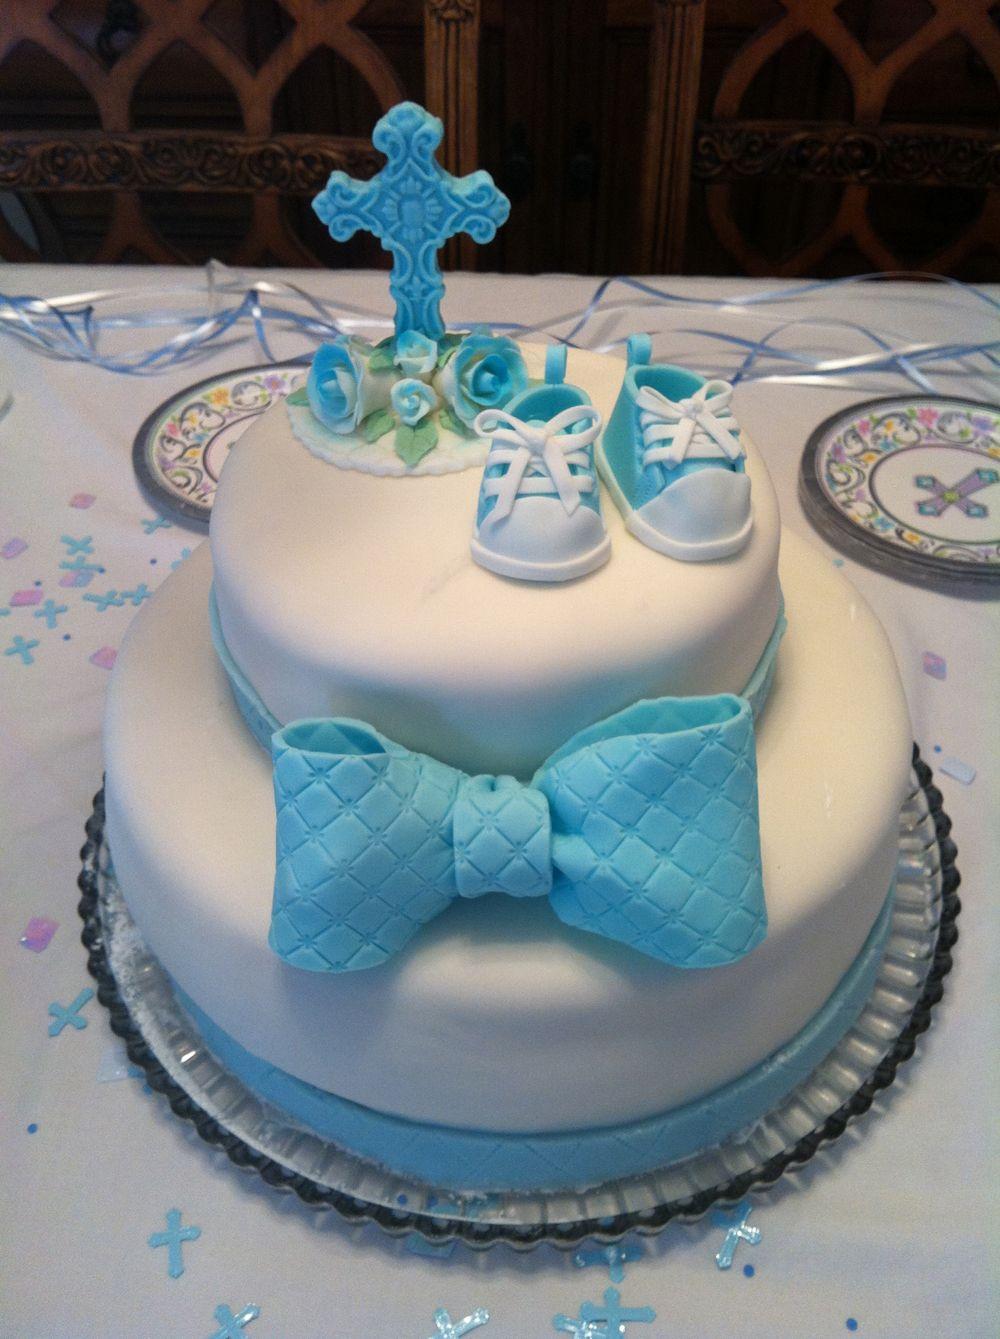 christening decorations ideas for boys   christening cake      rh   pinterest ie